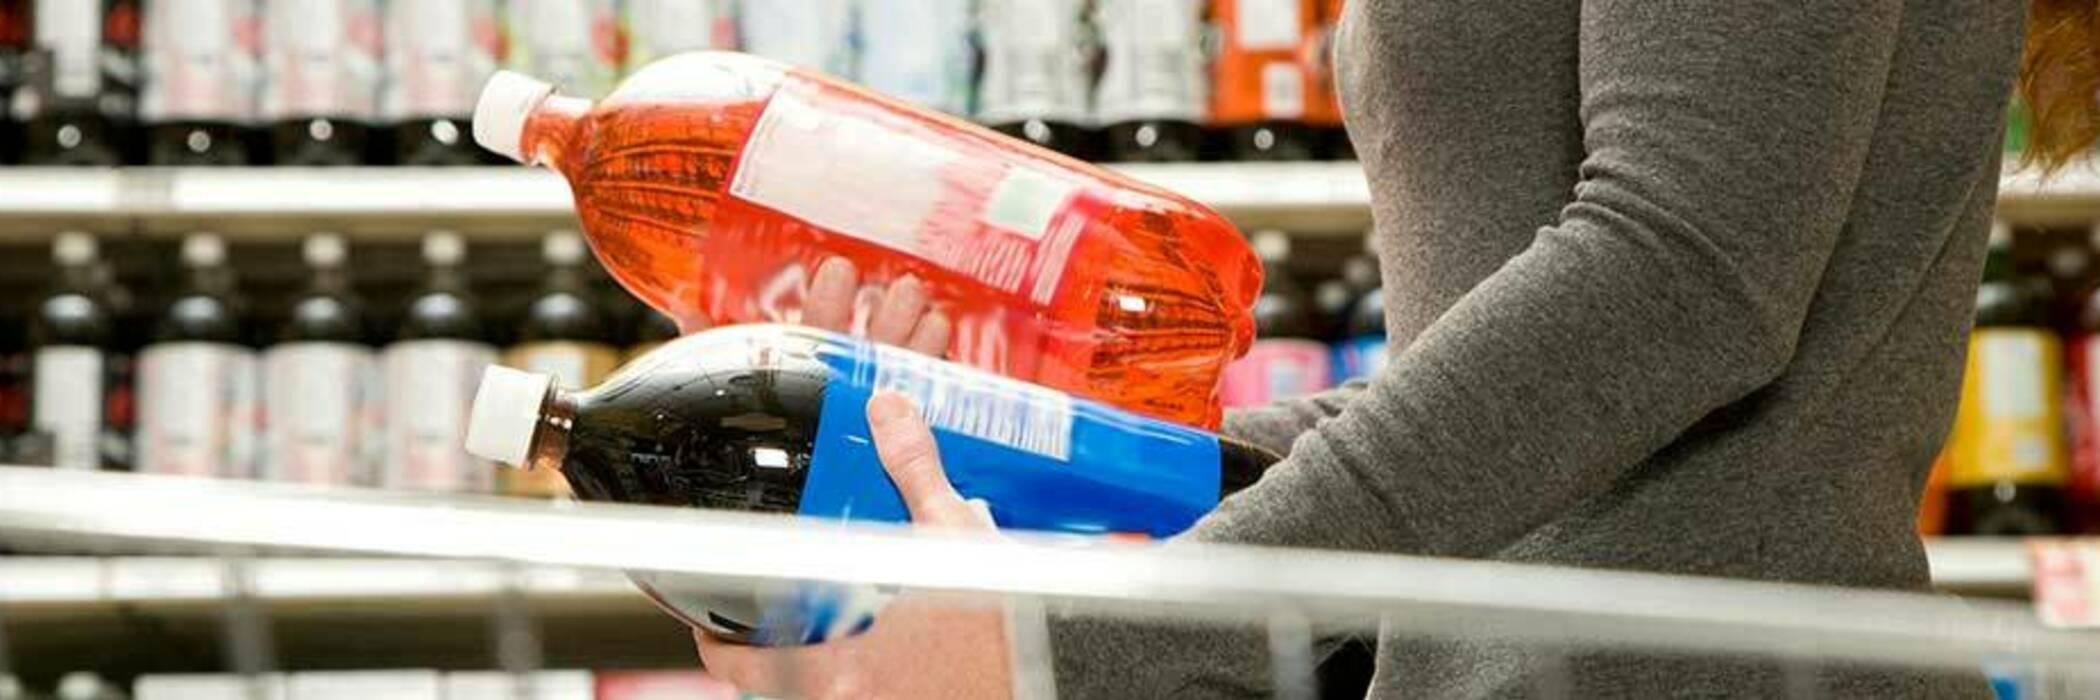 woman comparing soft drink bottles in supermarket